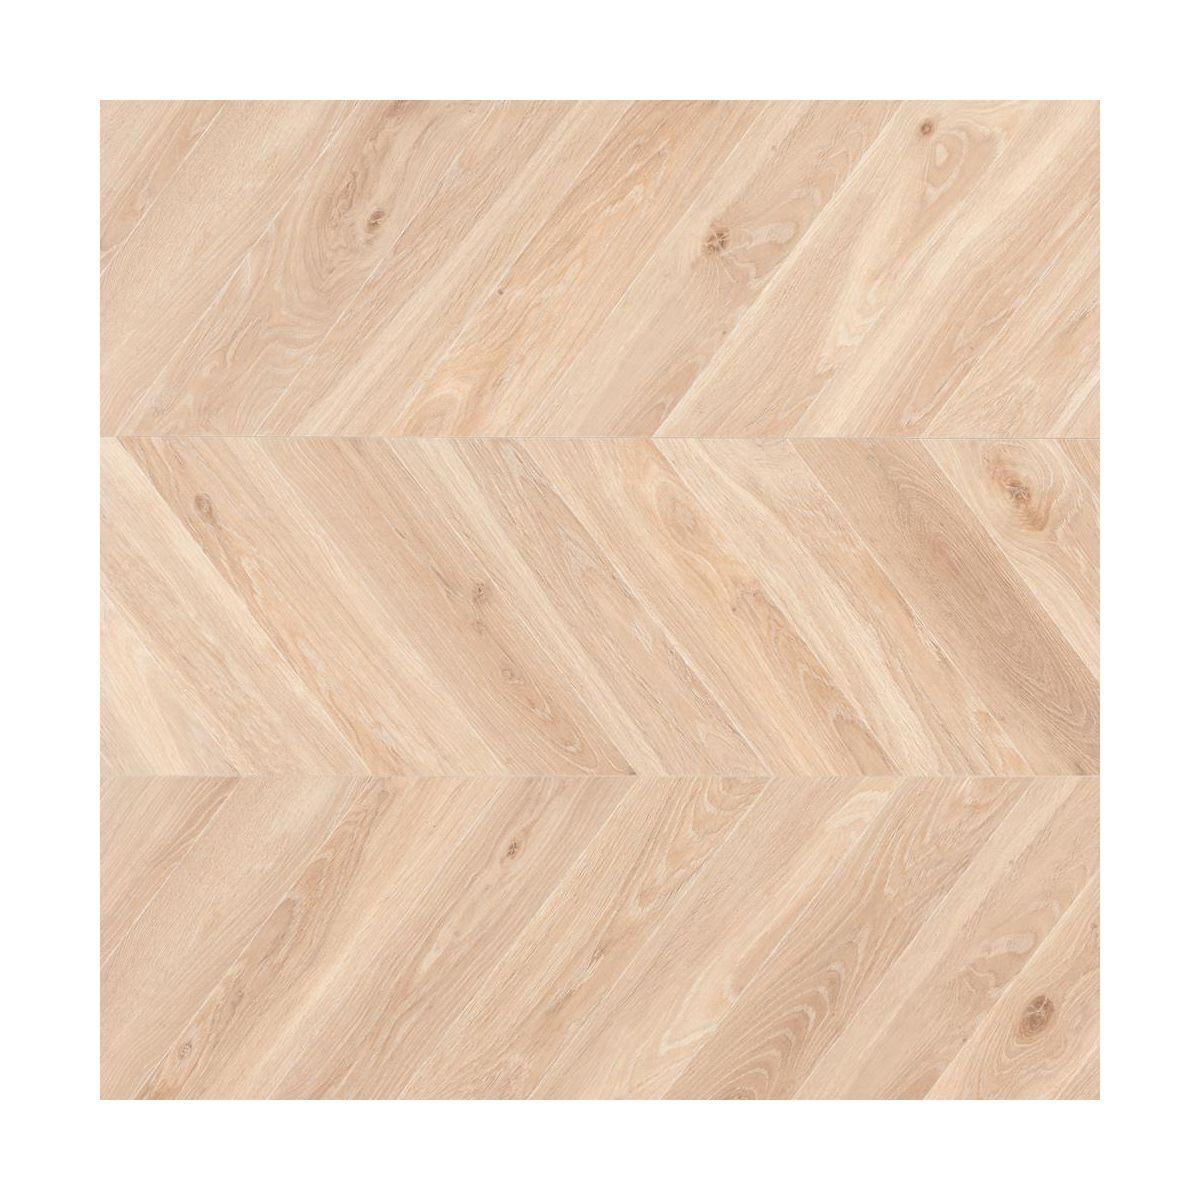 Panel Podlogowy Laminowany Dab Versailles Naturalny Ac4 8mm Parador Flooring Paneling Hardwood